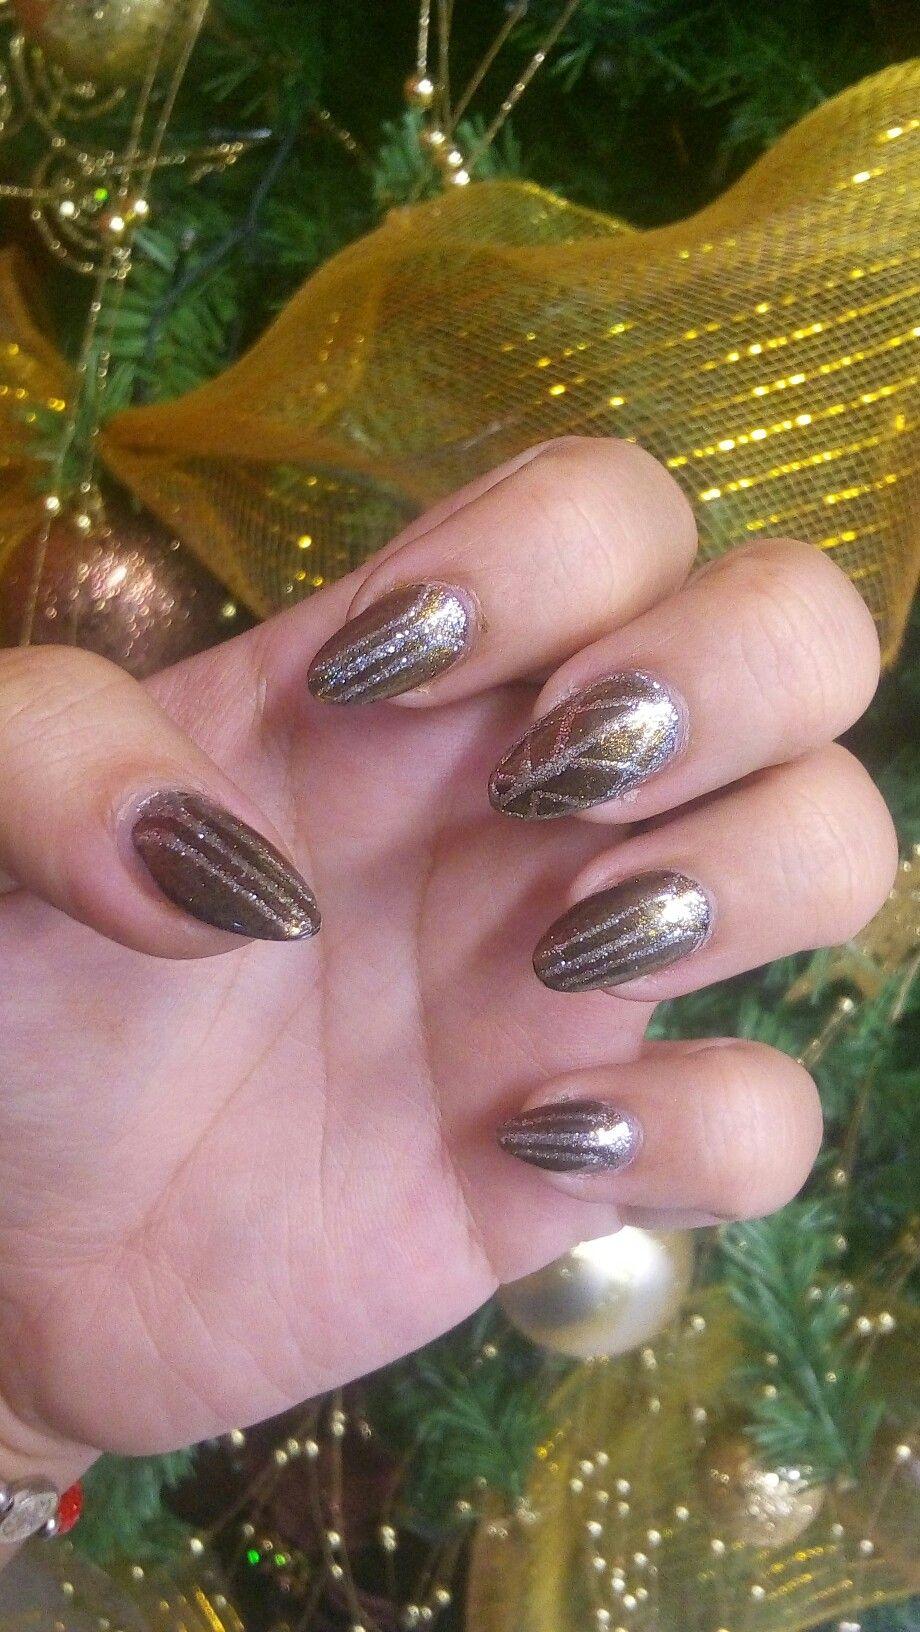 #nails #diseño #shellac #gelish #punta #almendra